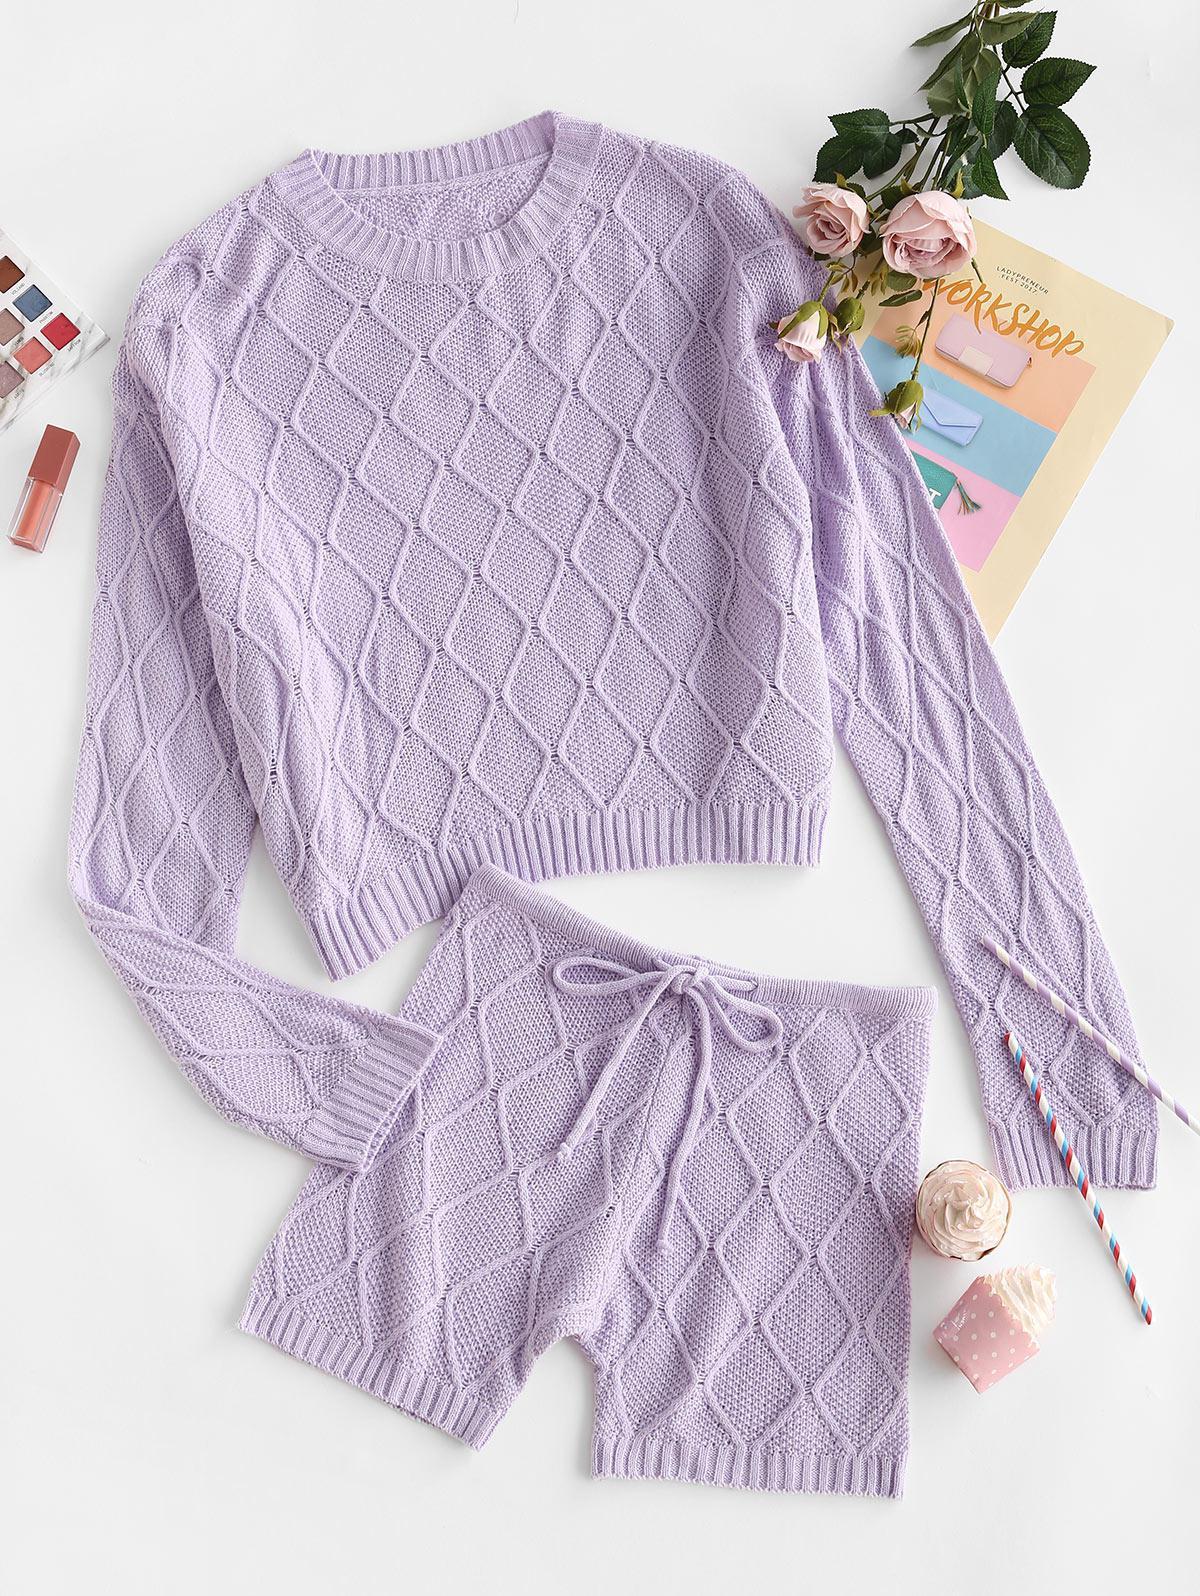 Rhombus Knit Drop Shoulder Drawstring Sweater and Shorts Set